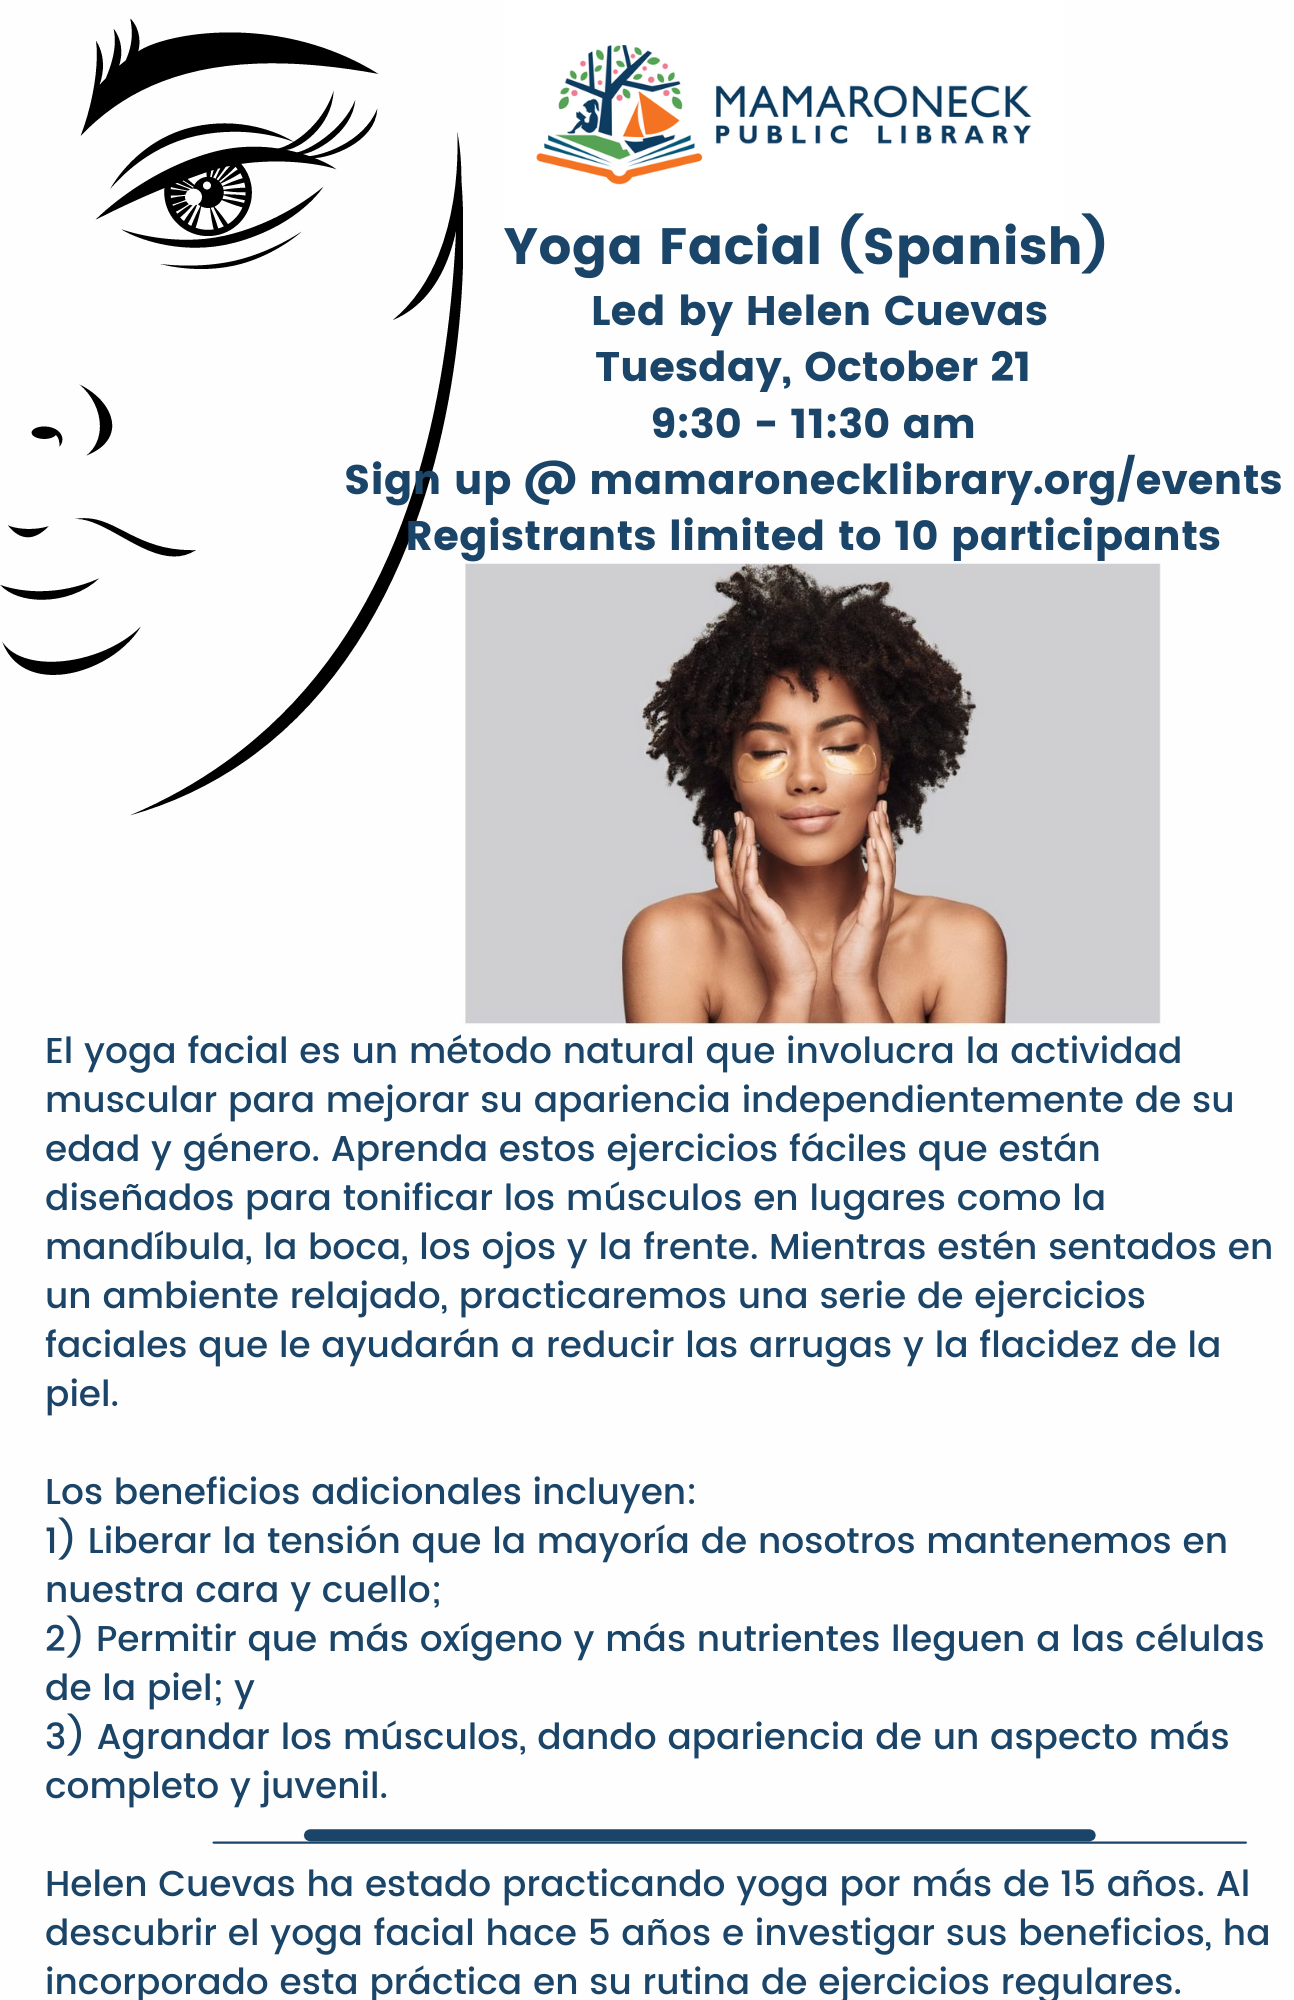 facial yoga flyer in Spanish